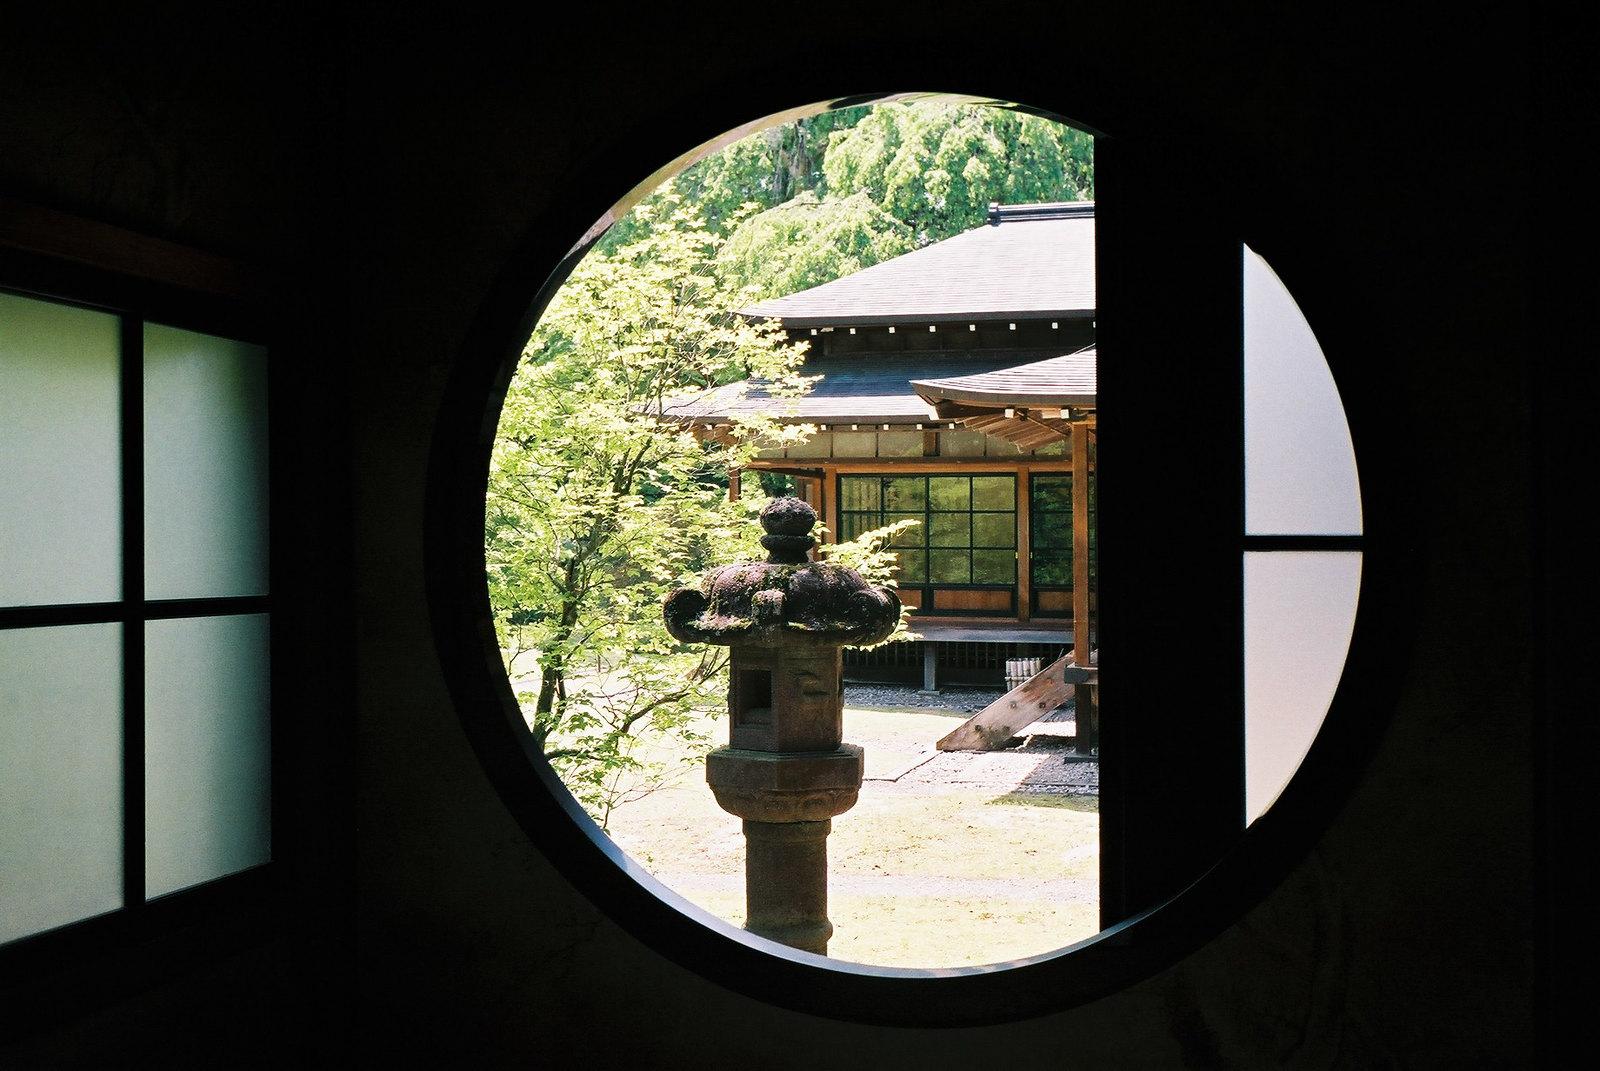 circular window